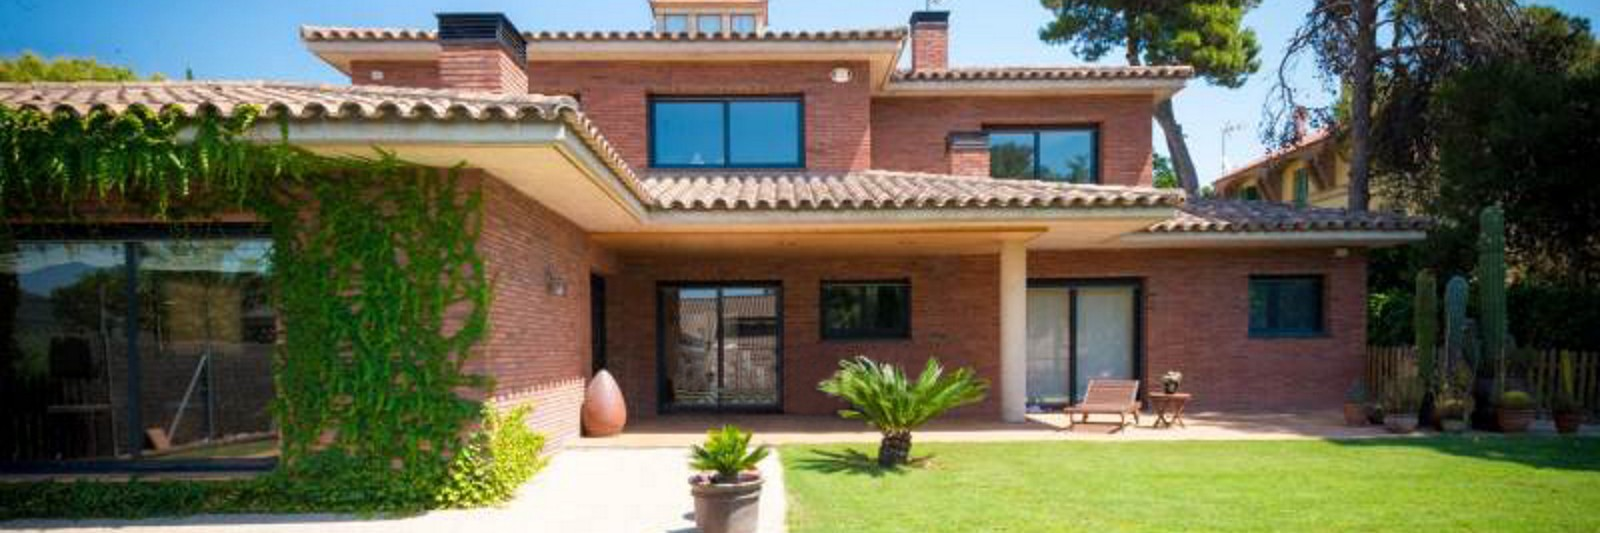 MG Inmobiliaria Sant Cugat - jto-escayola